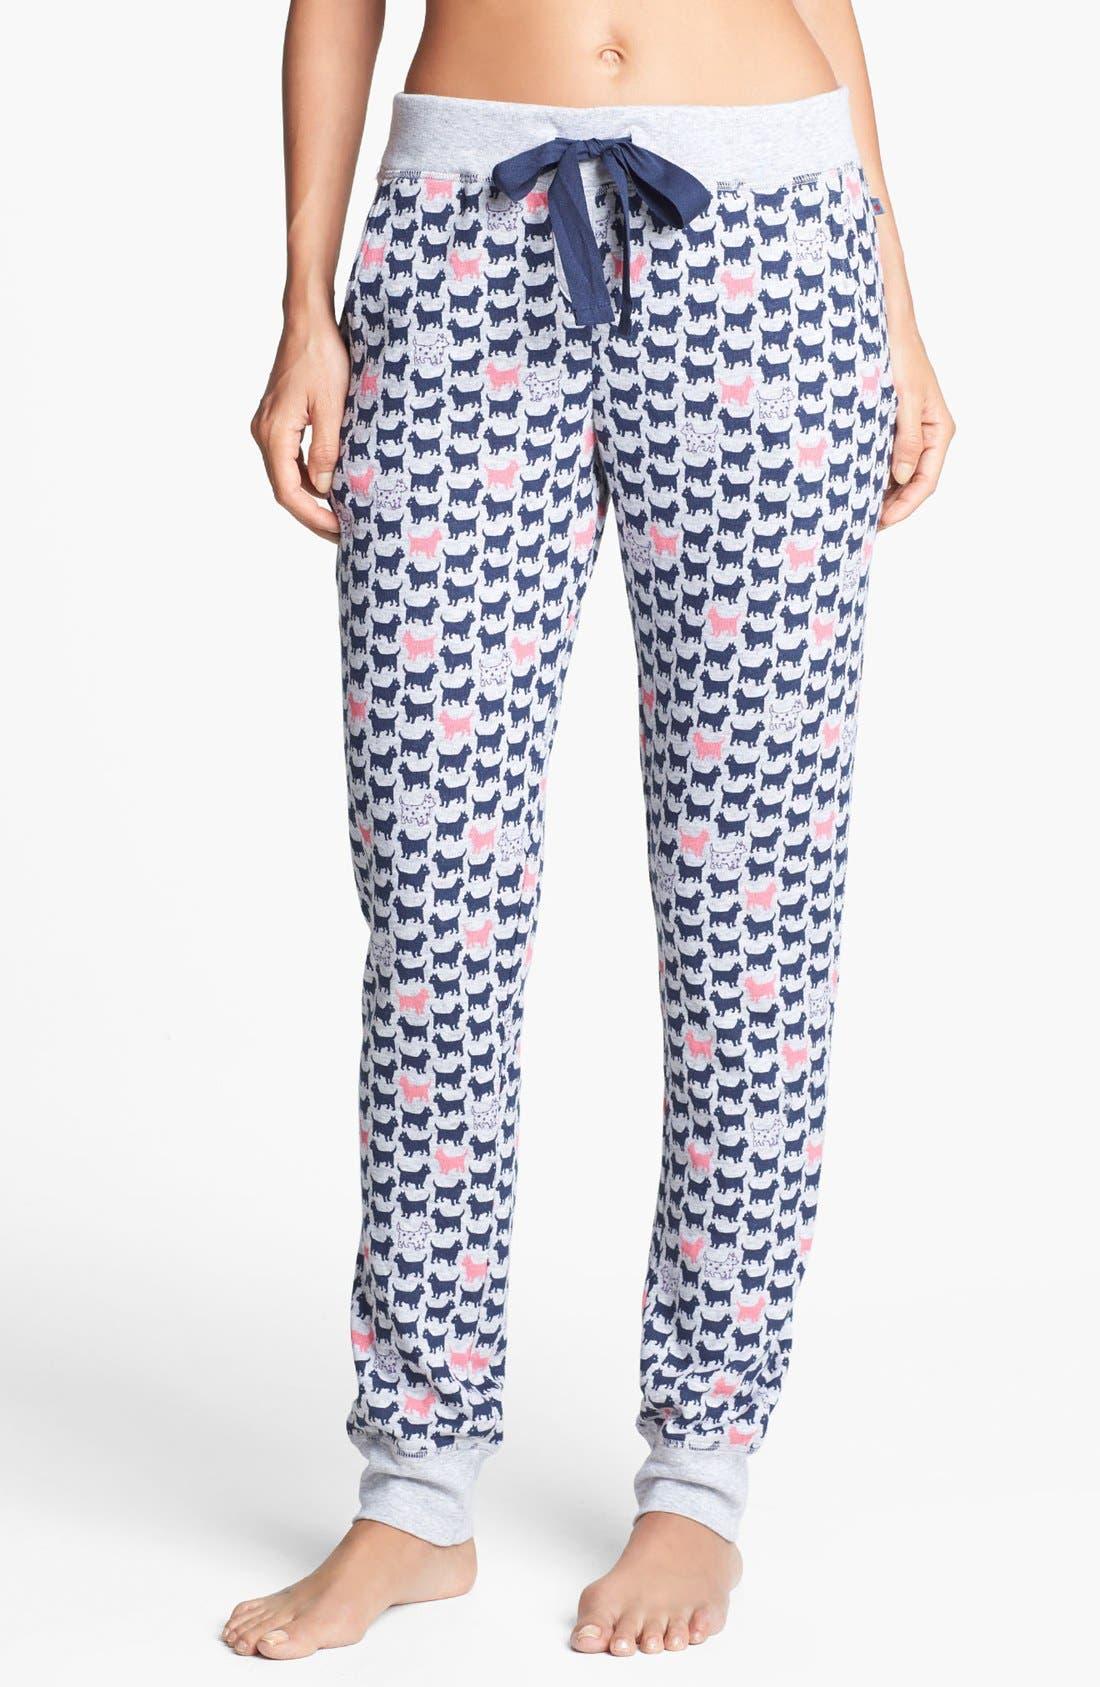 Alternate Image 1 Selected - Jane & Bleecker New York Double Knit Pants